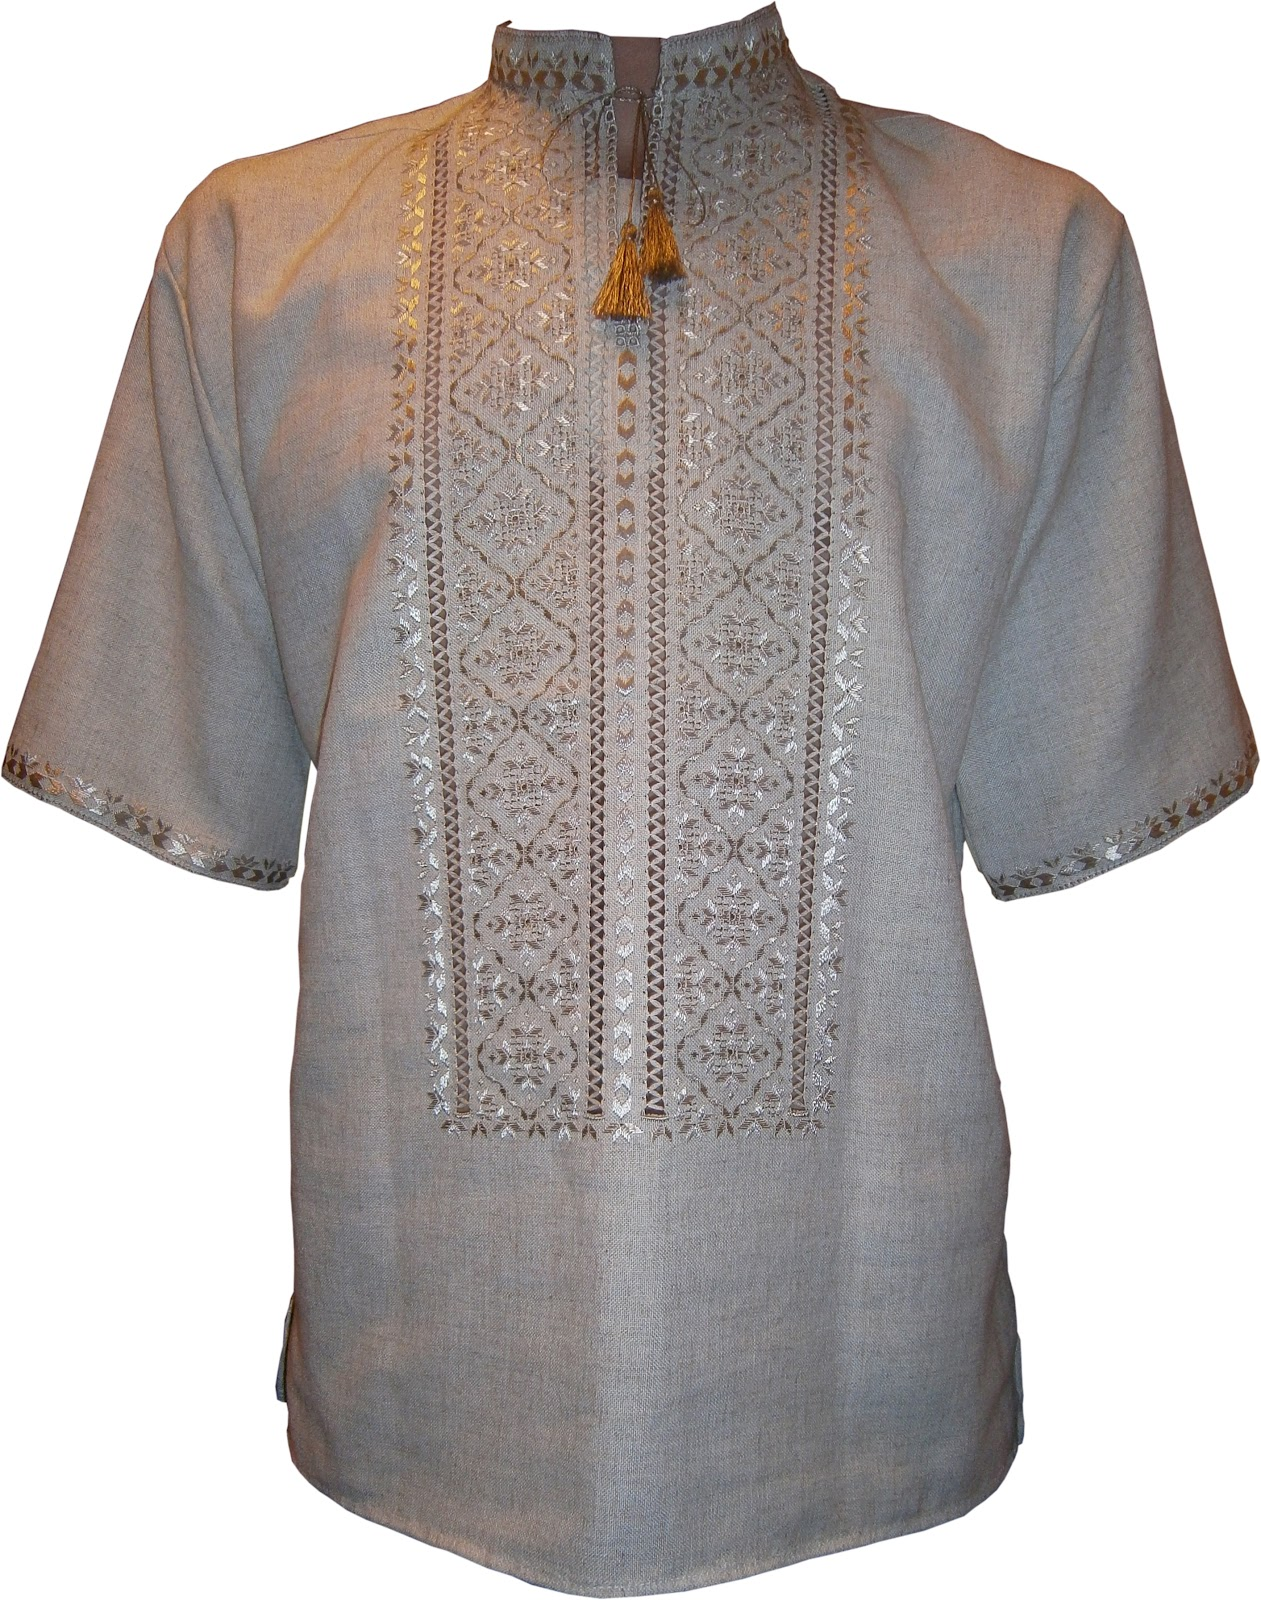 Вишиванка - Інтернет-магазин вишиванок dabf1ce1e0e17